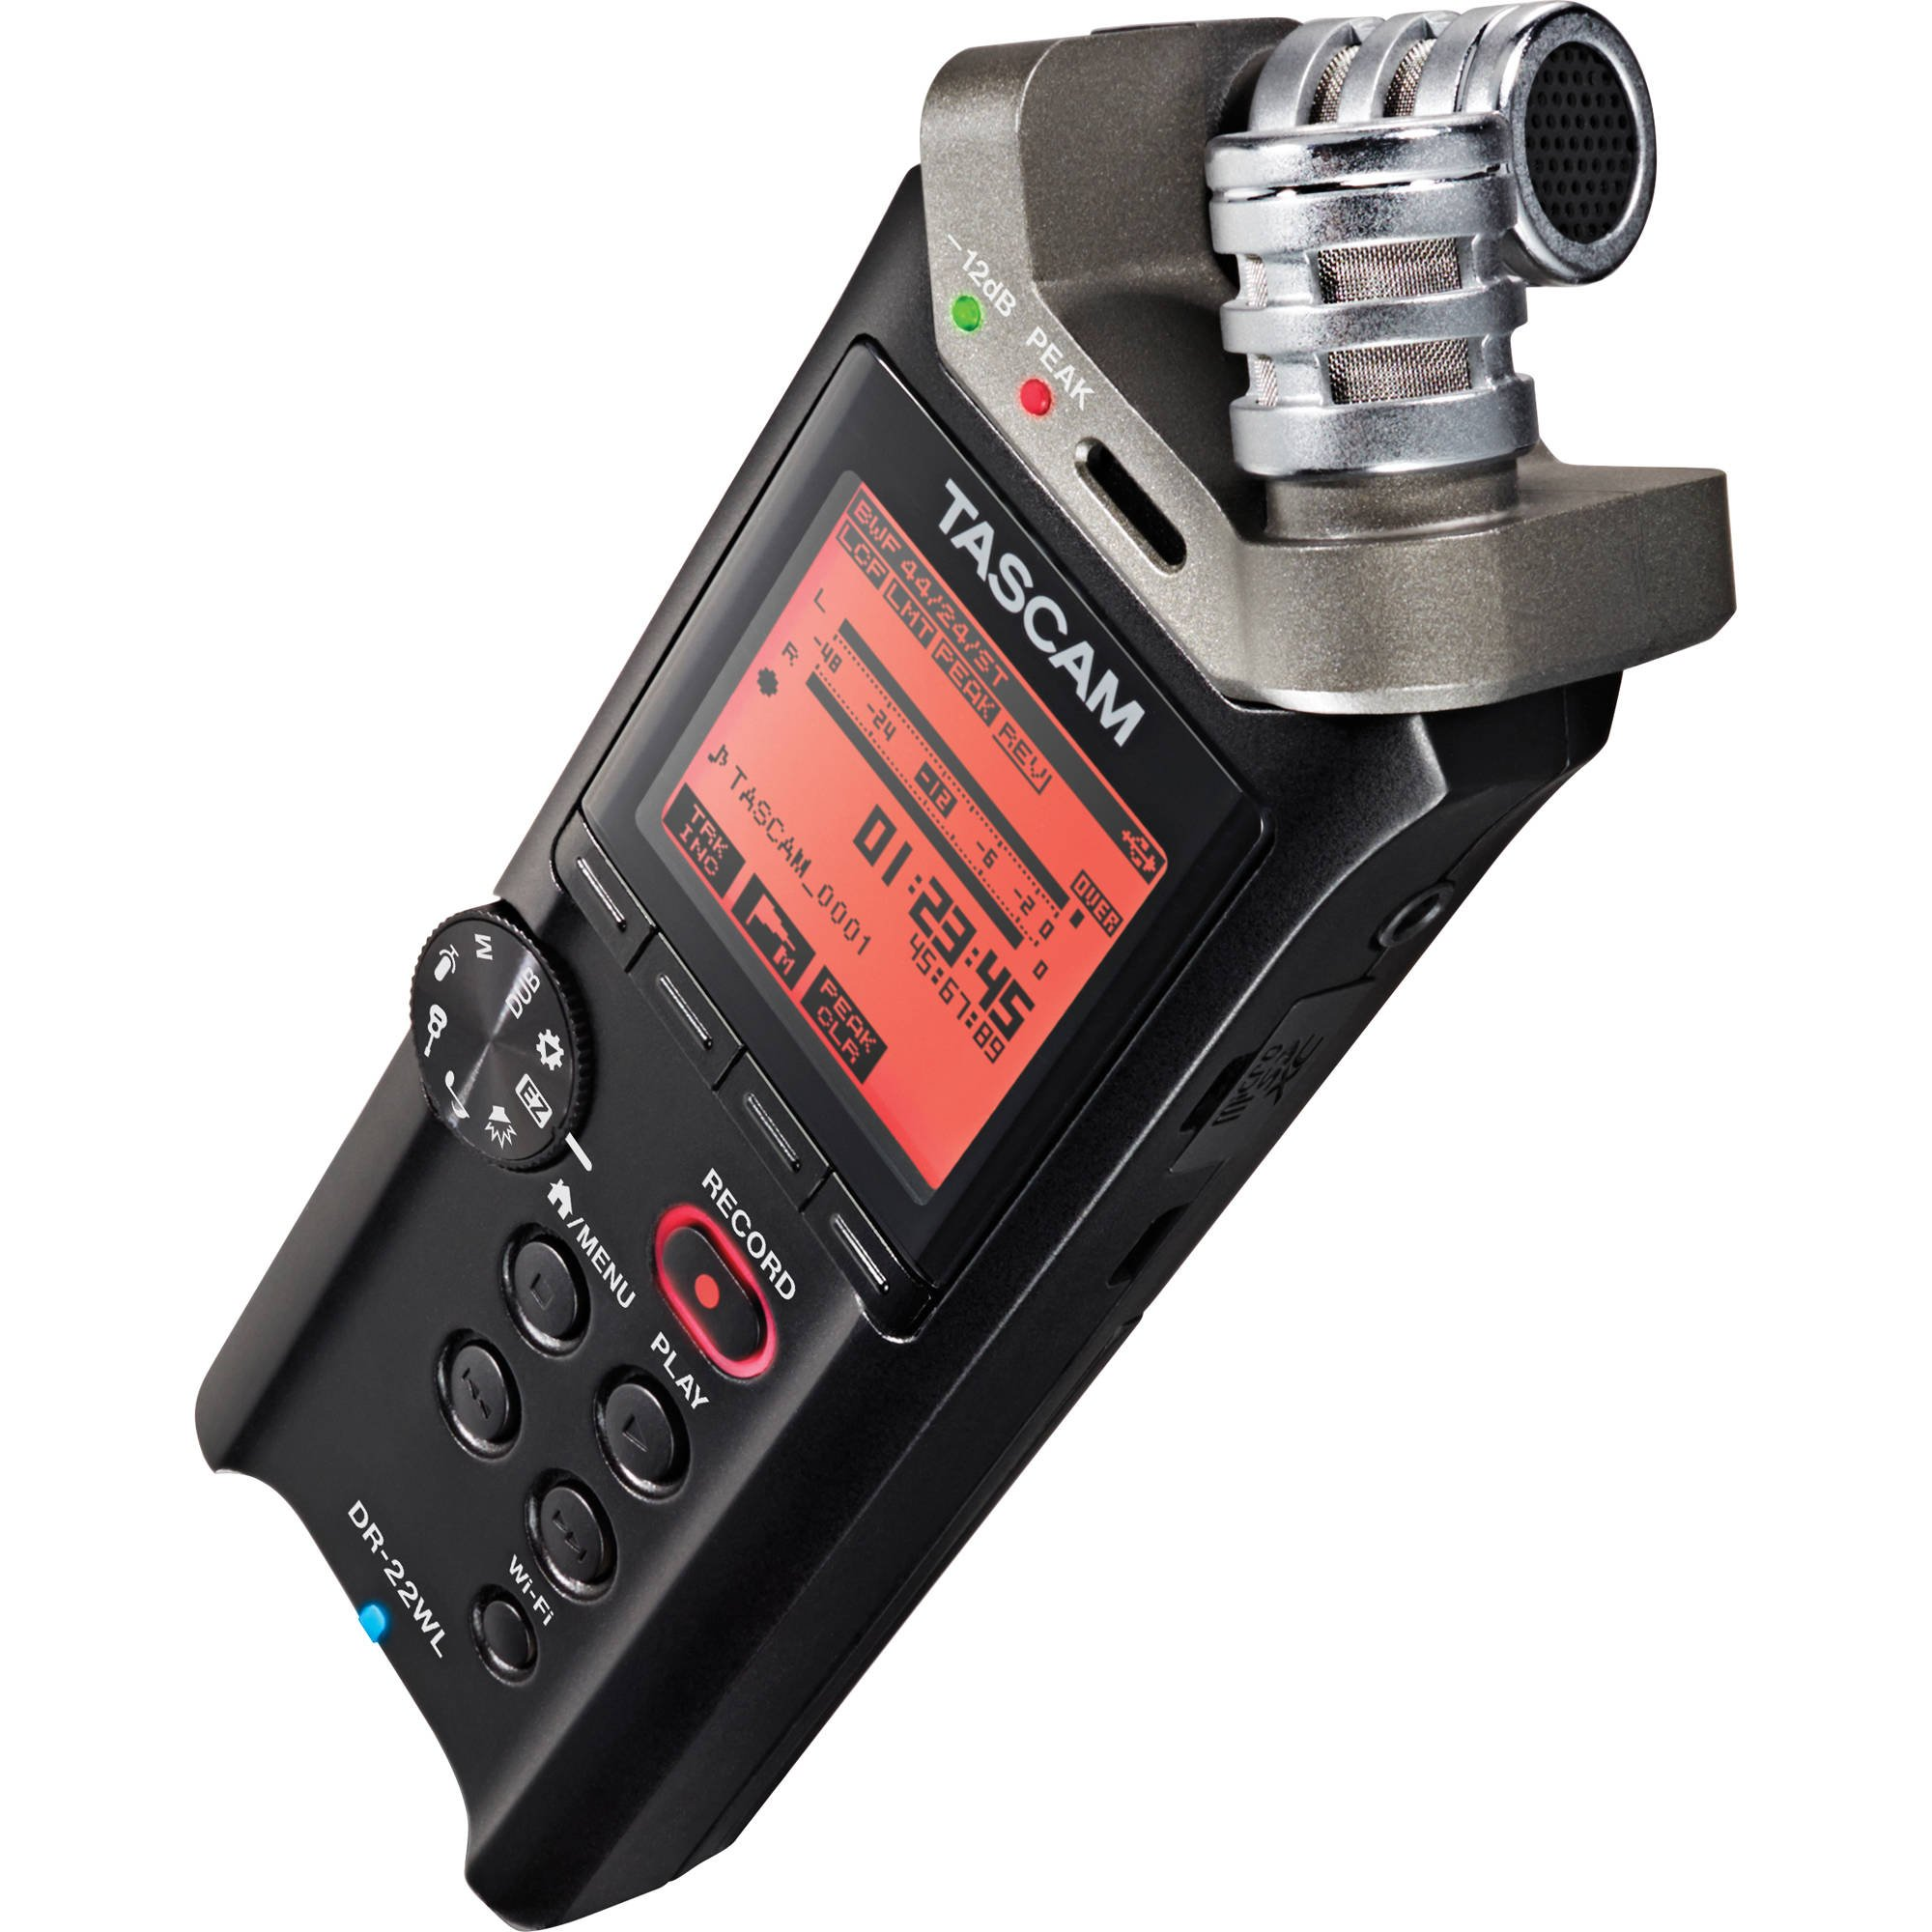 TASCAM DR-22WL ruční audio rekordér s Wi-Fi